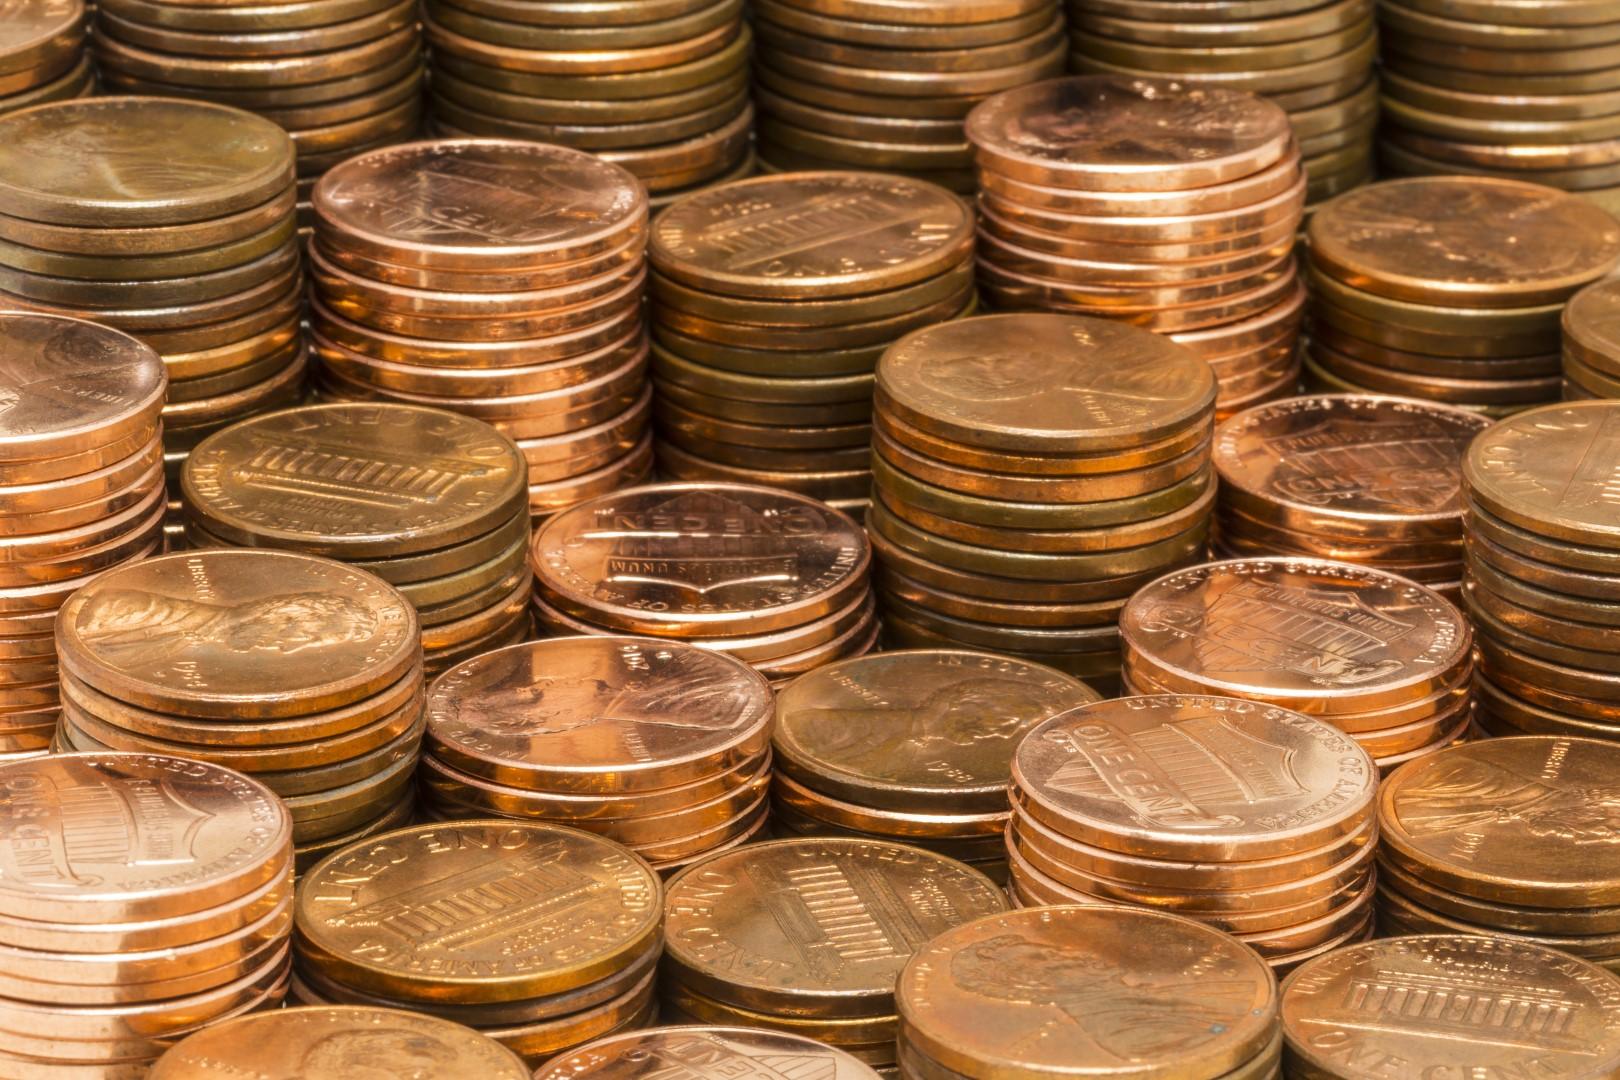 penny-Large.jpg